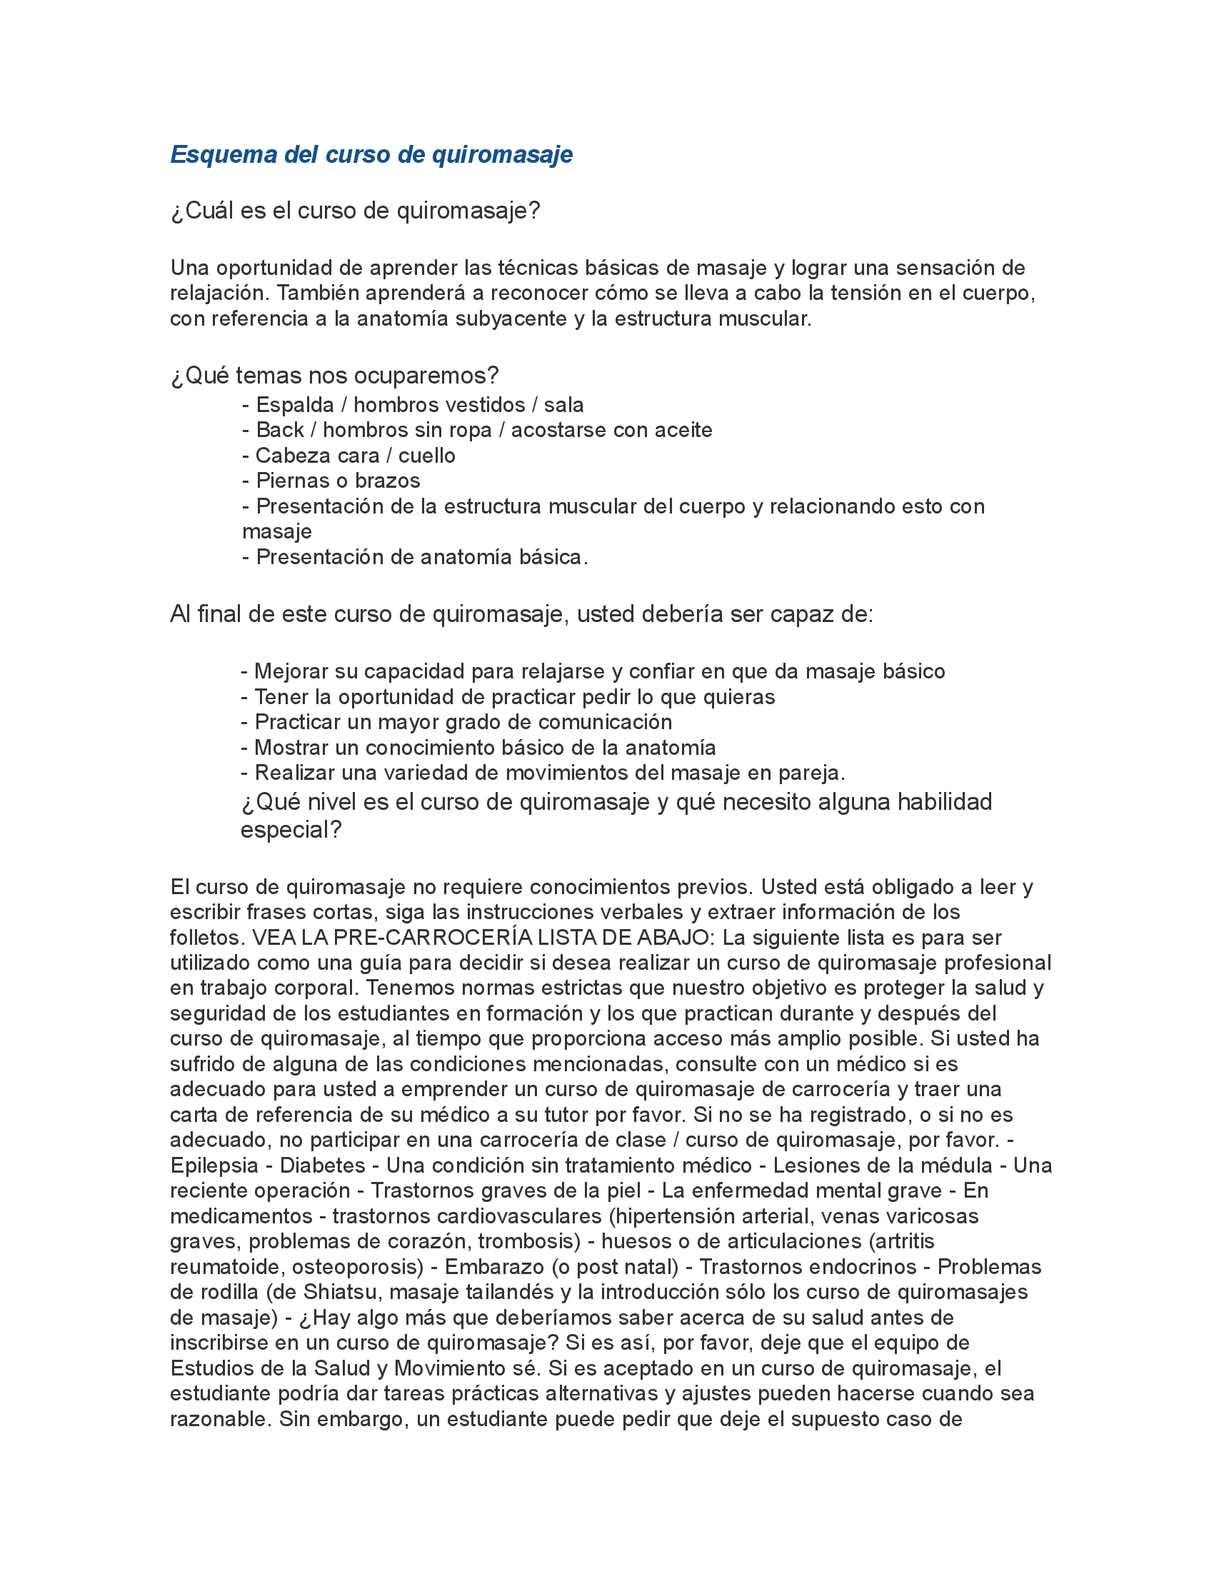 Calaméo - Esquema del curso de quiromasaje